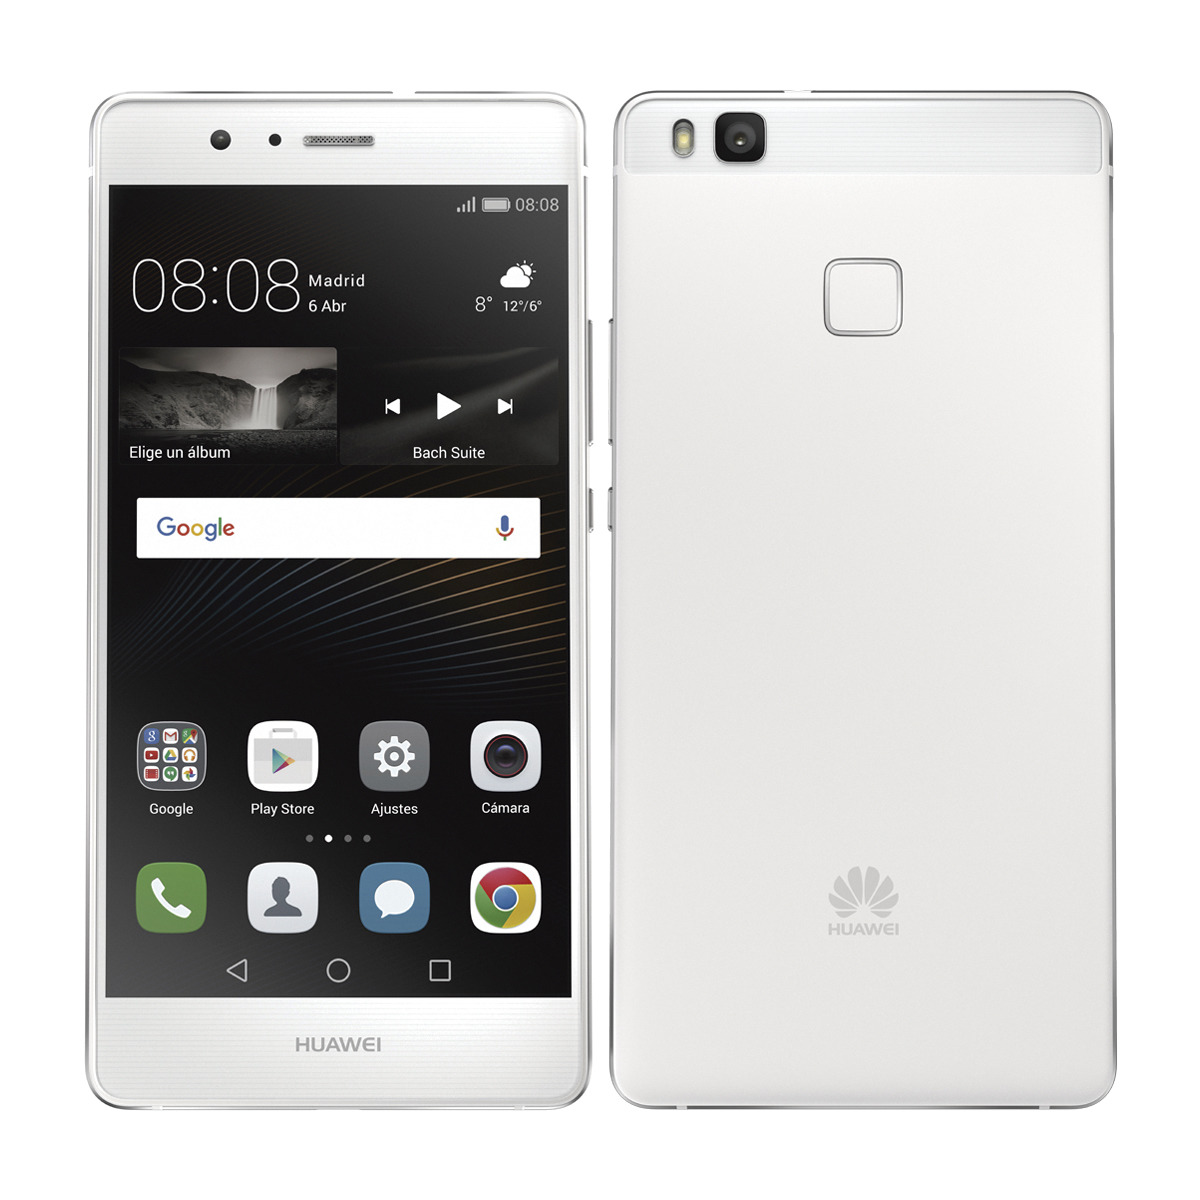 c80c7e84e2e Huawei P9 Lite libre, precio, características, análisis en Español, barato,  vs P9, vs P8 Lite, alternativas – Comprar Móviles YA!